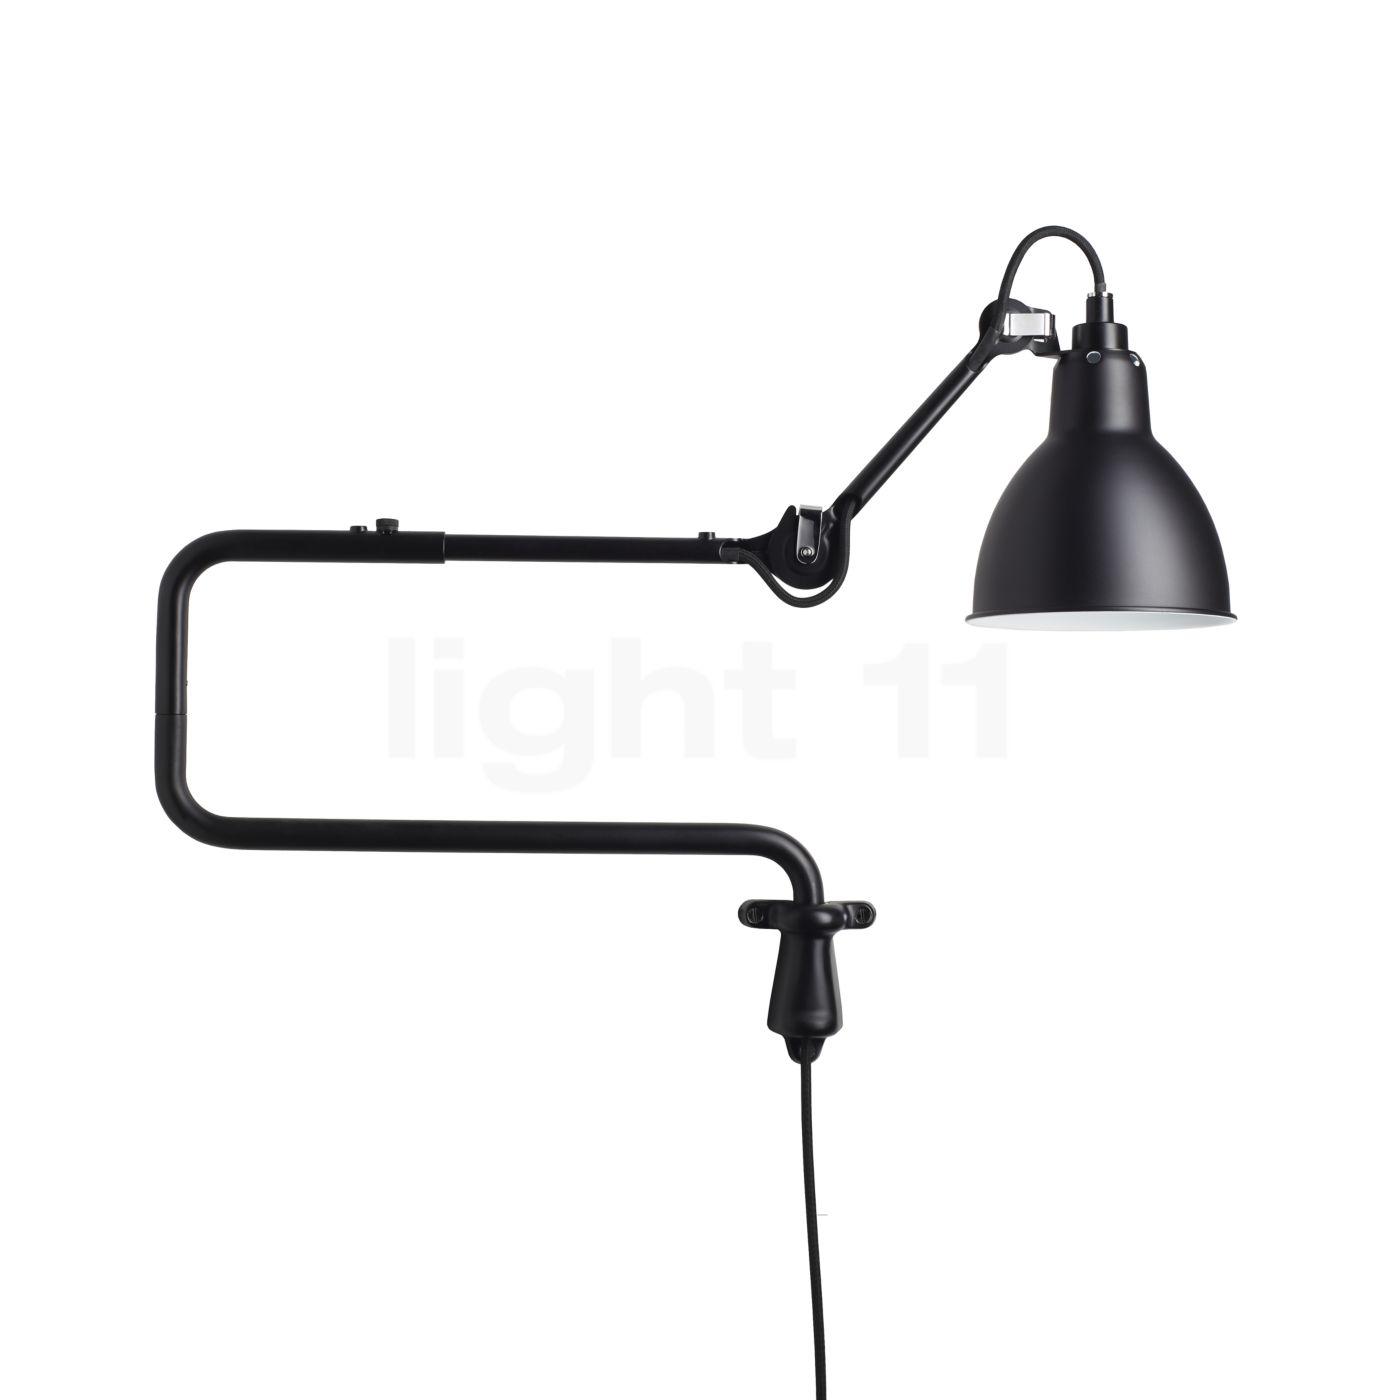 dcw lampe gras no 303 wandleuchte wandleuchten mit stecker. Black Bedroom Furniture Sets. Home Design Ideas